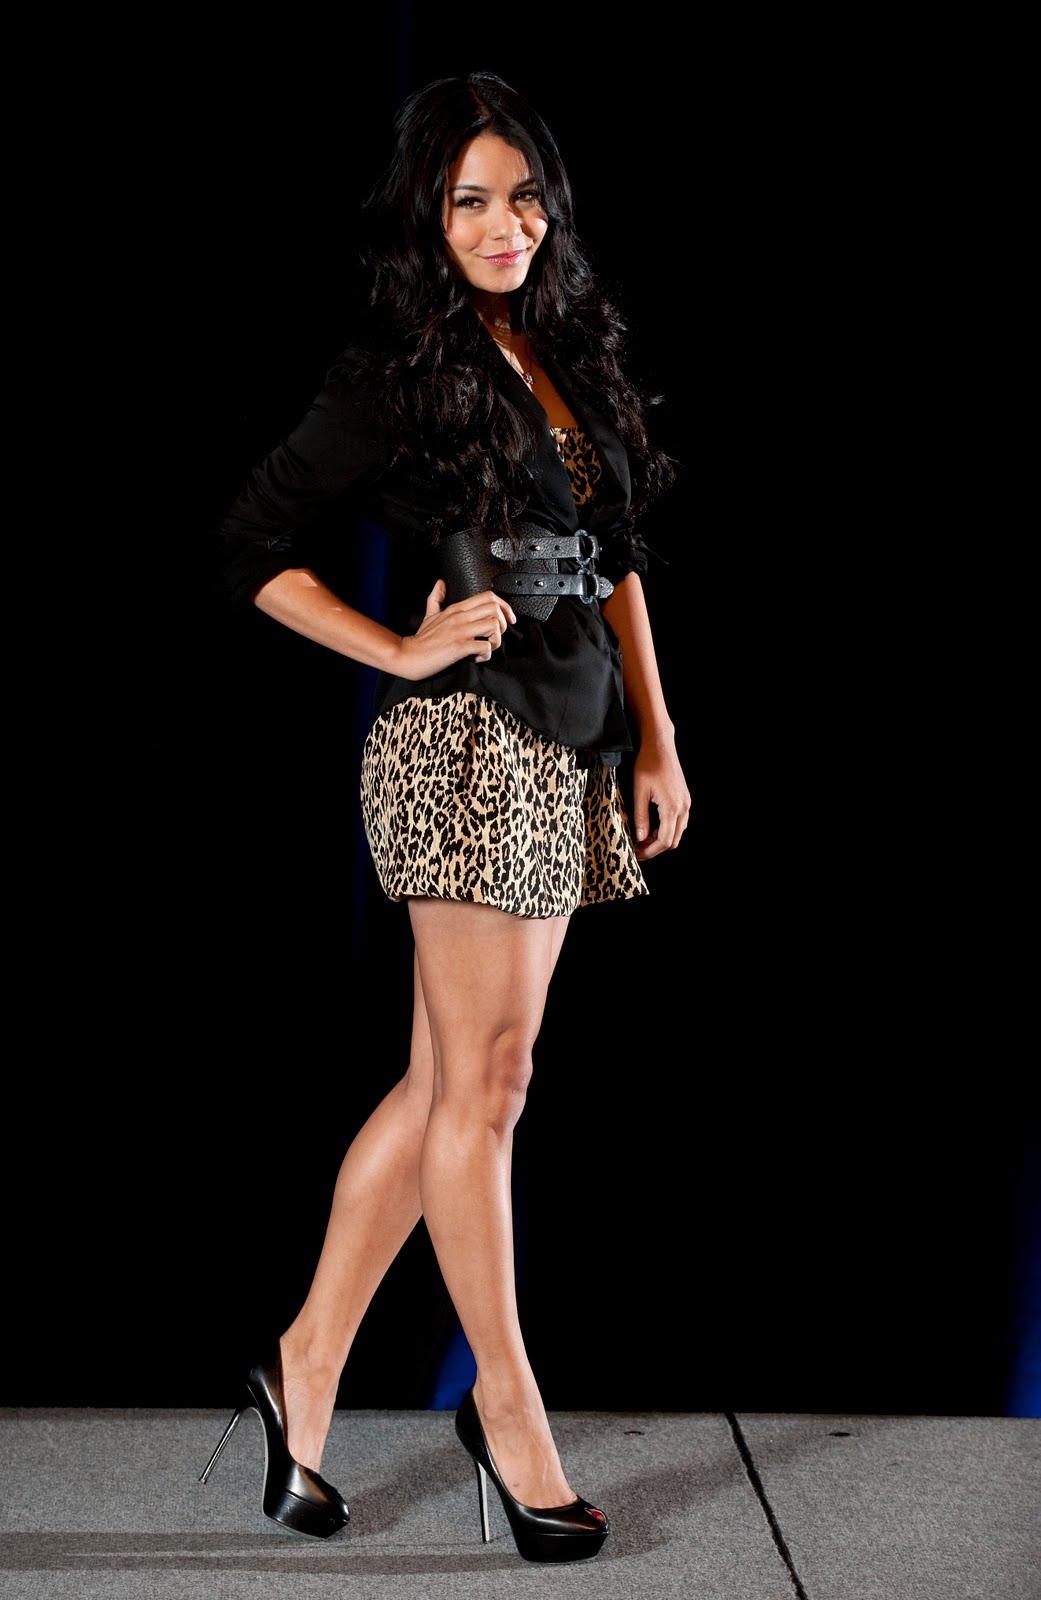 Vanessa Hudgens In Las Vegas Hot Heels Styles